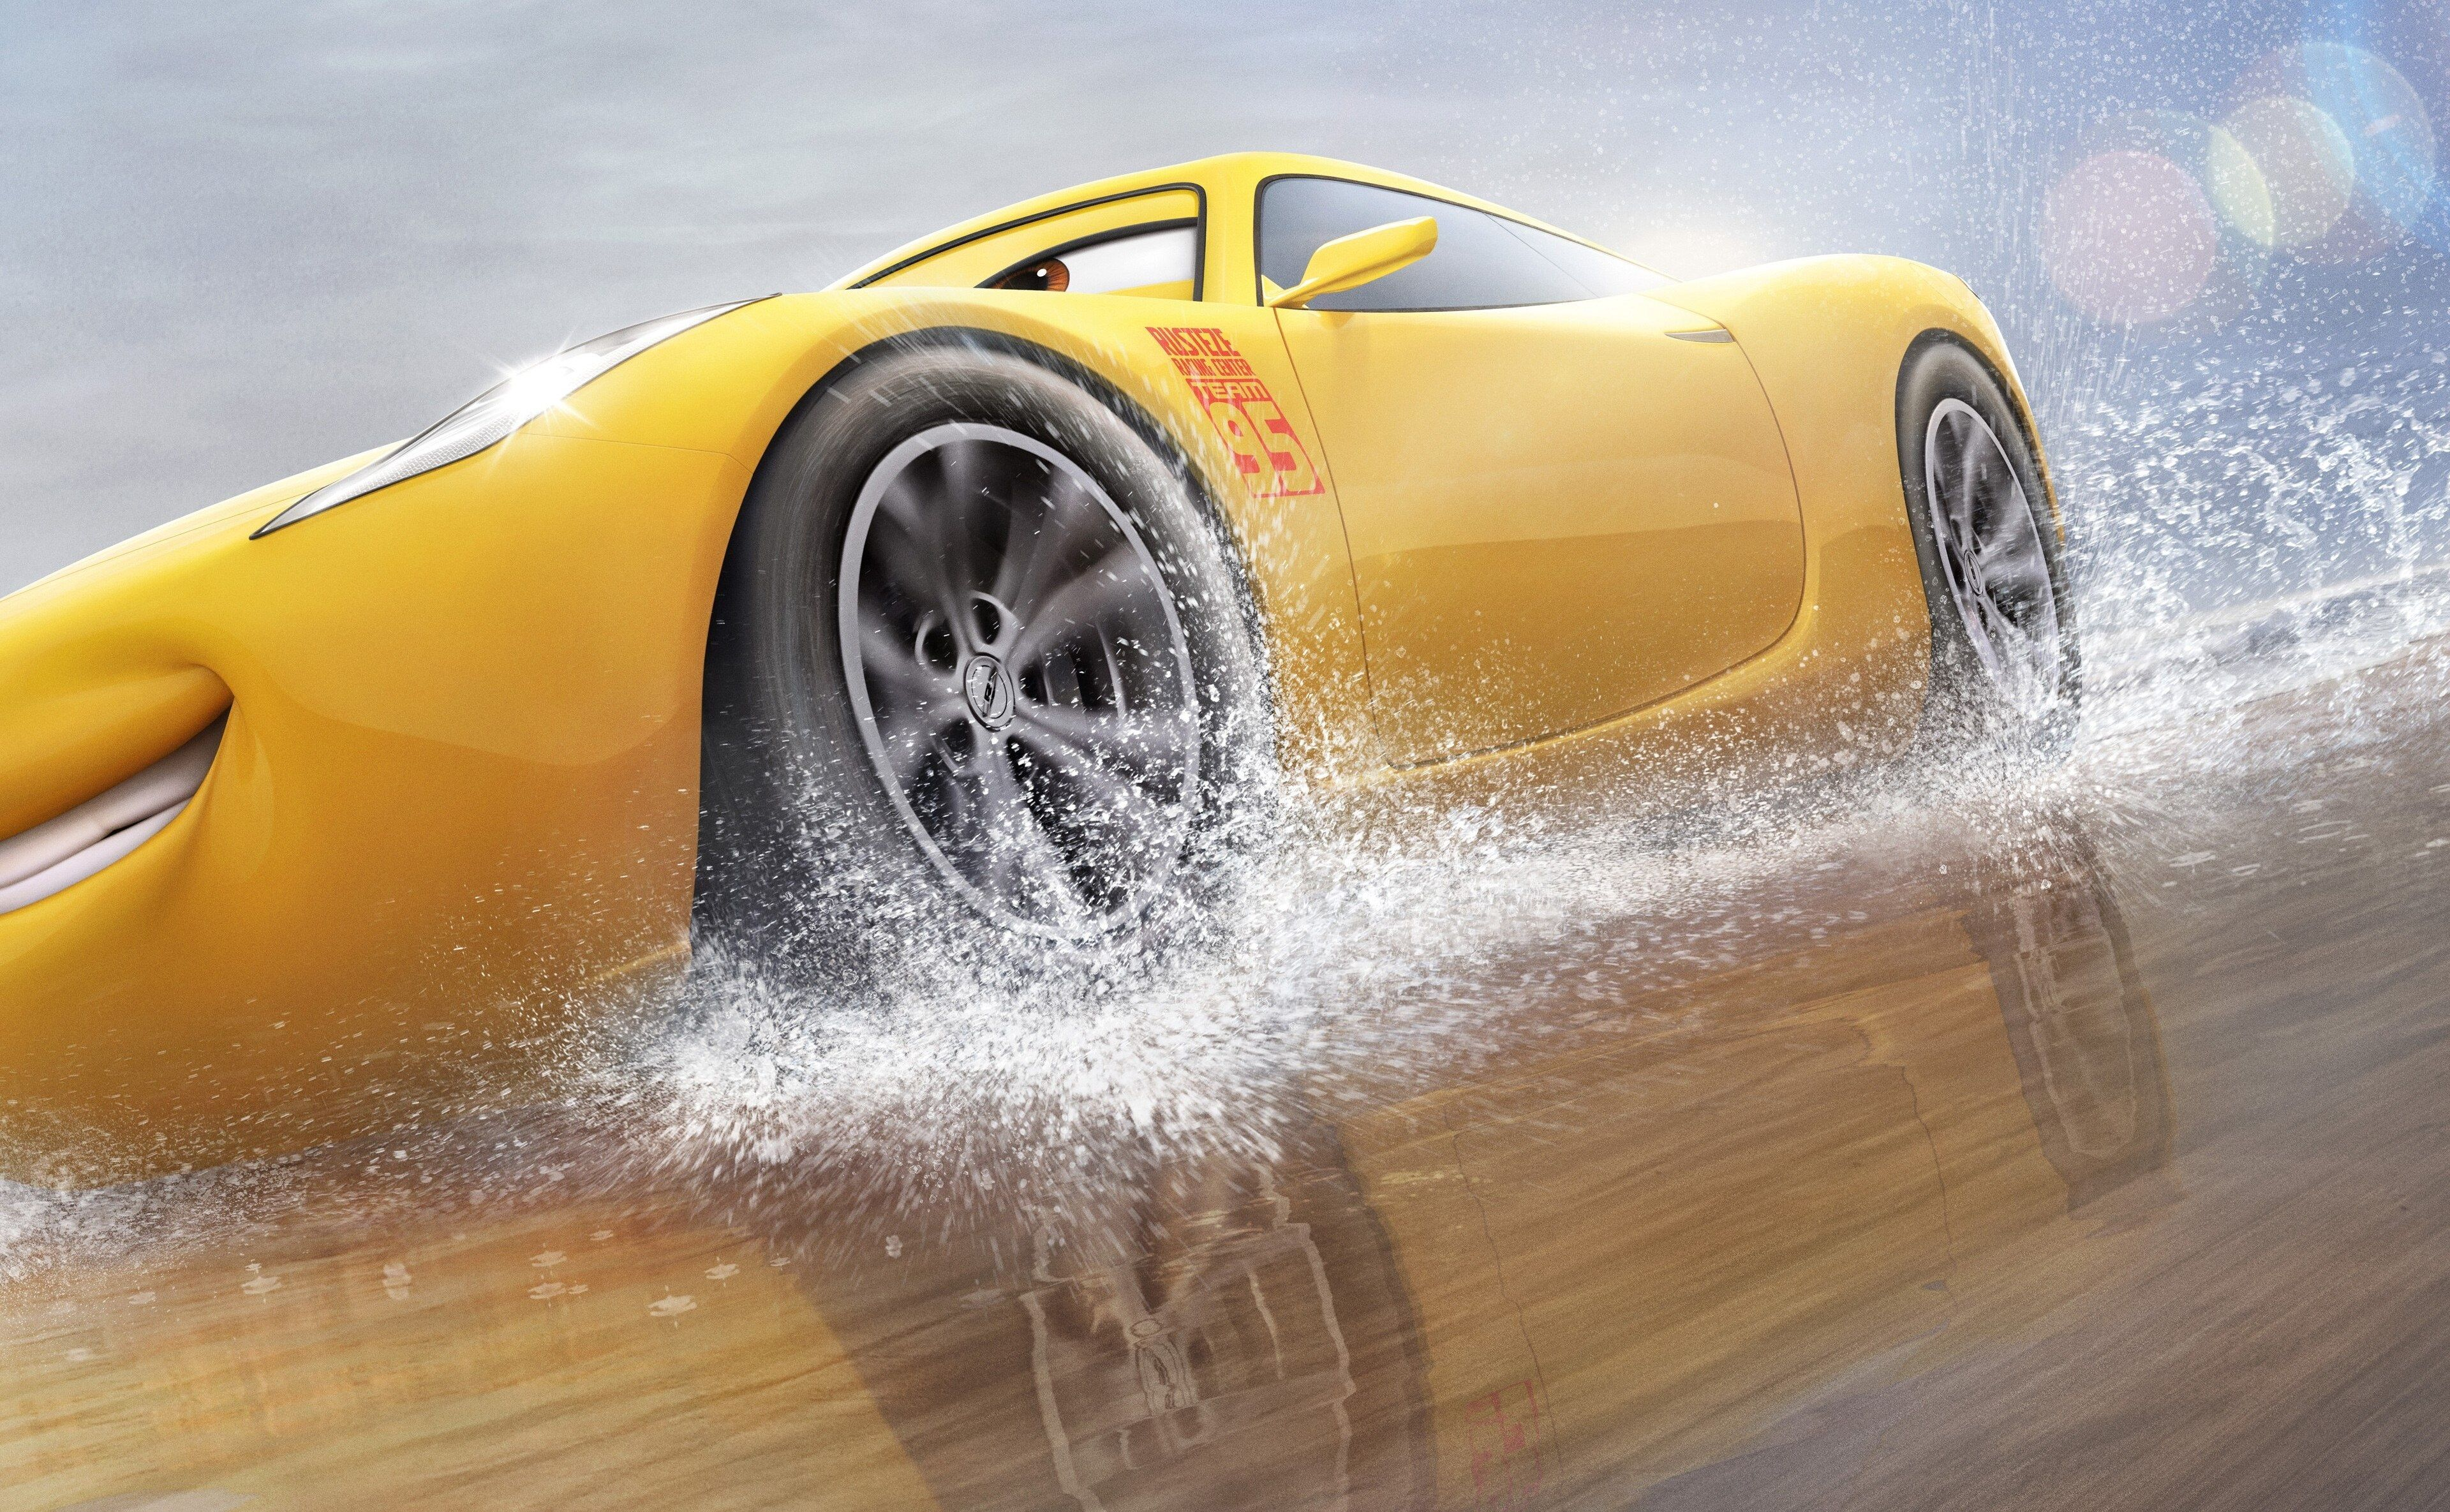 3840x2370 Cars 3 4k Desktop Wallpaper Hd Cruz Ramirez Disney